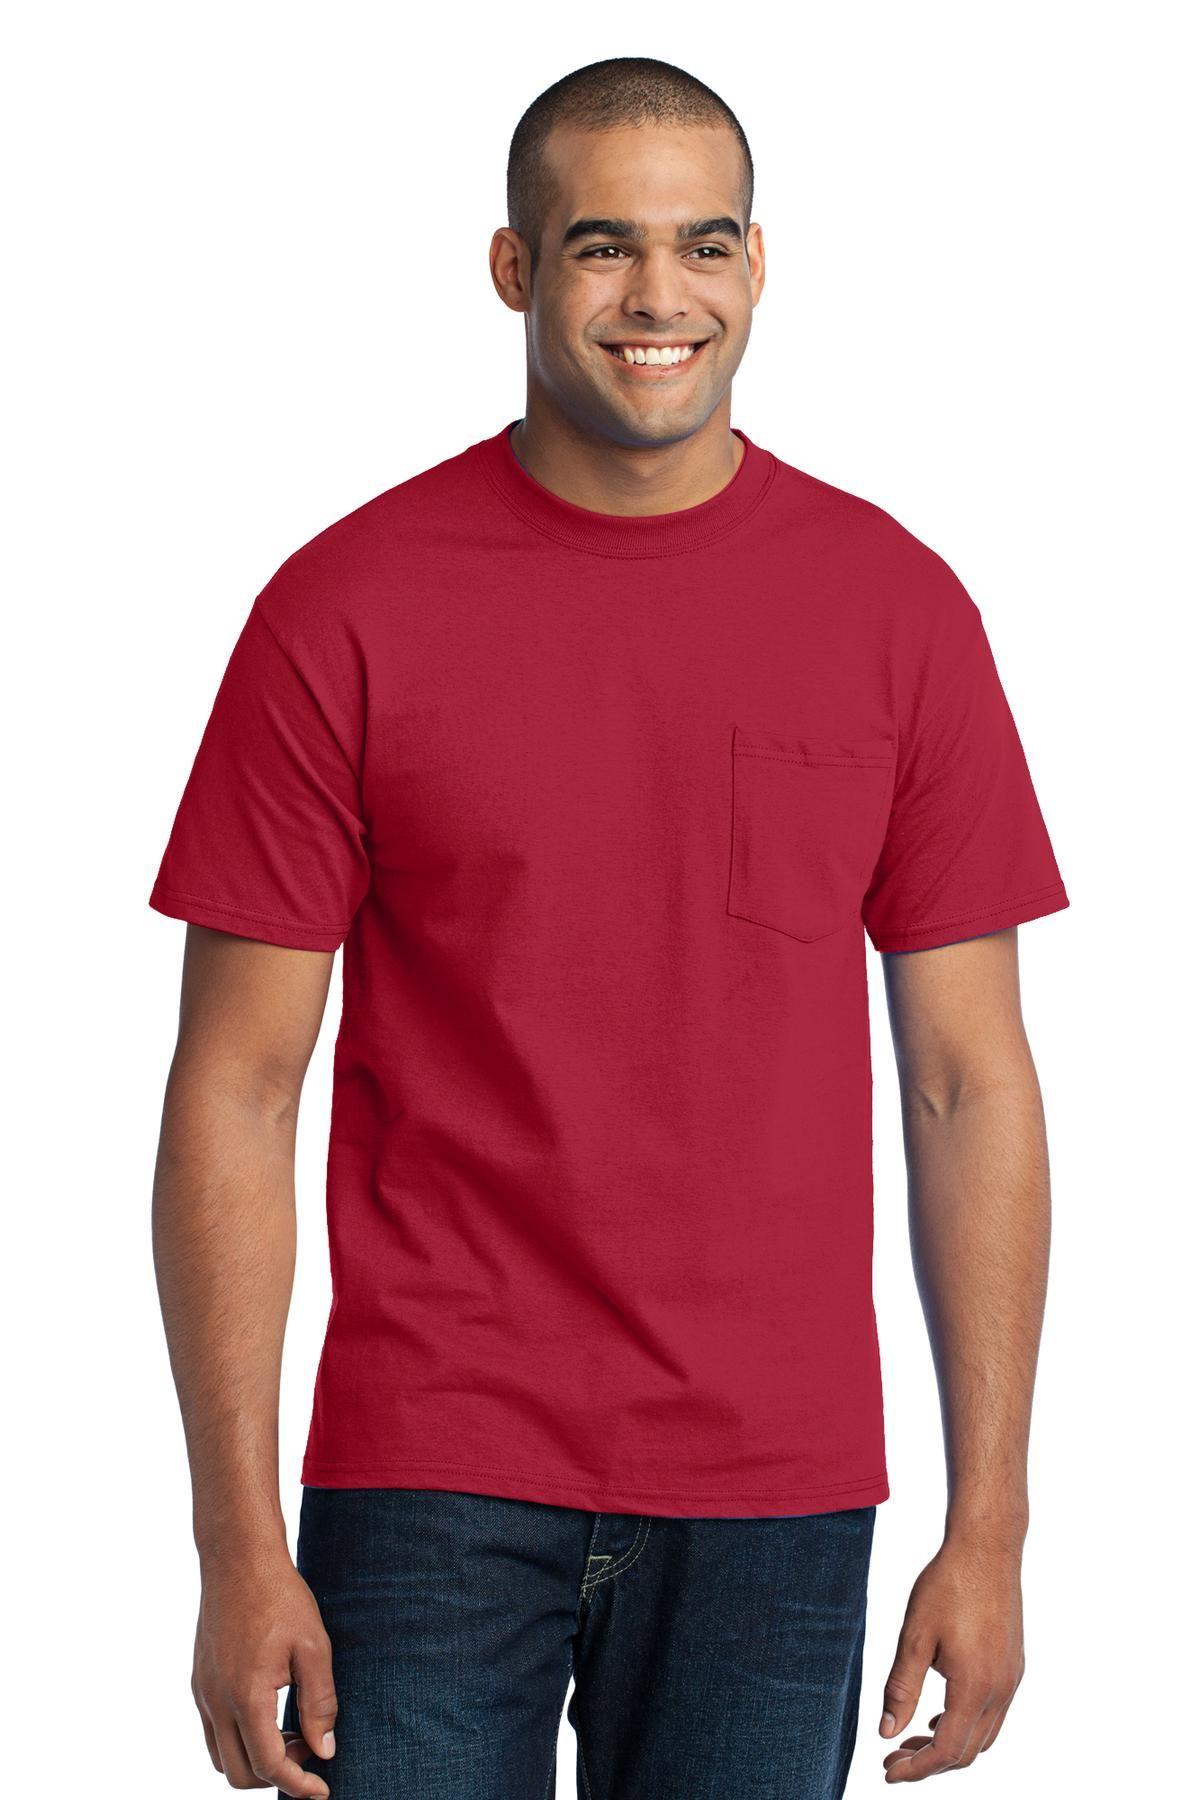 Sanmar Wholesale Imprintable Apparel Accessories Pocket Tee Men Shirts Pocket Tee